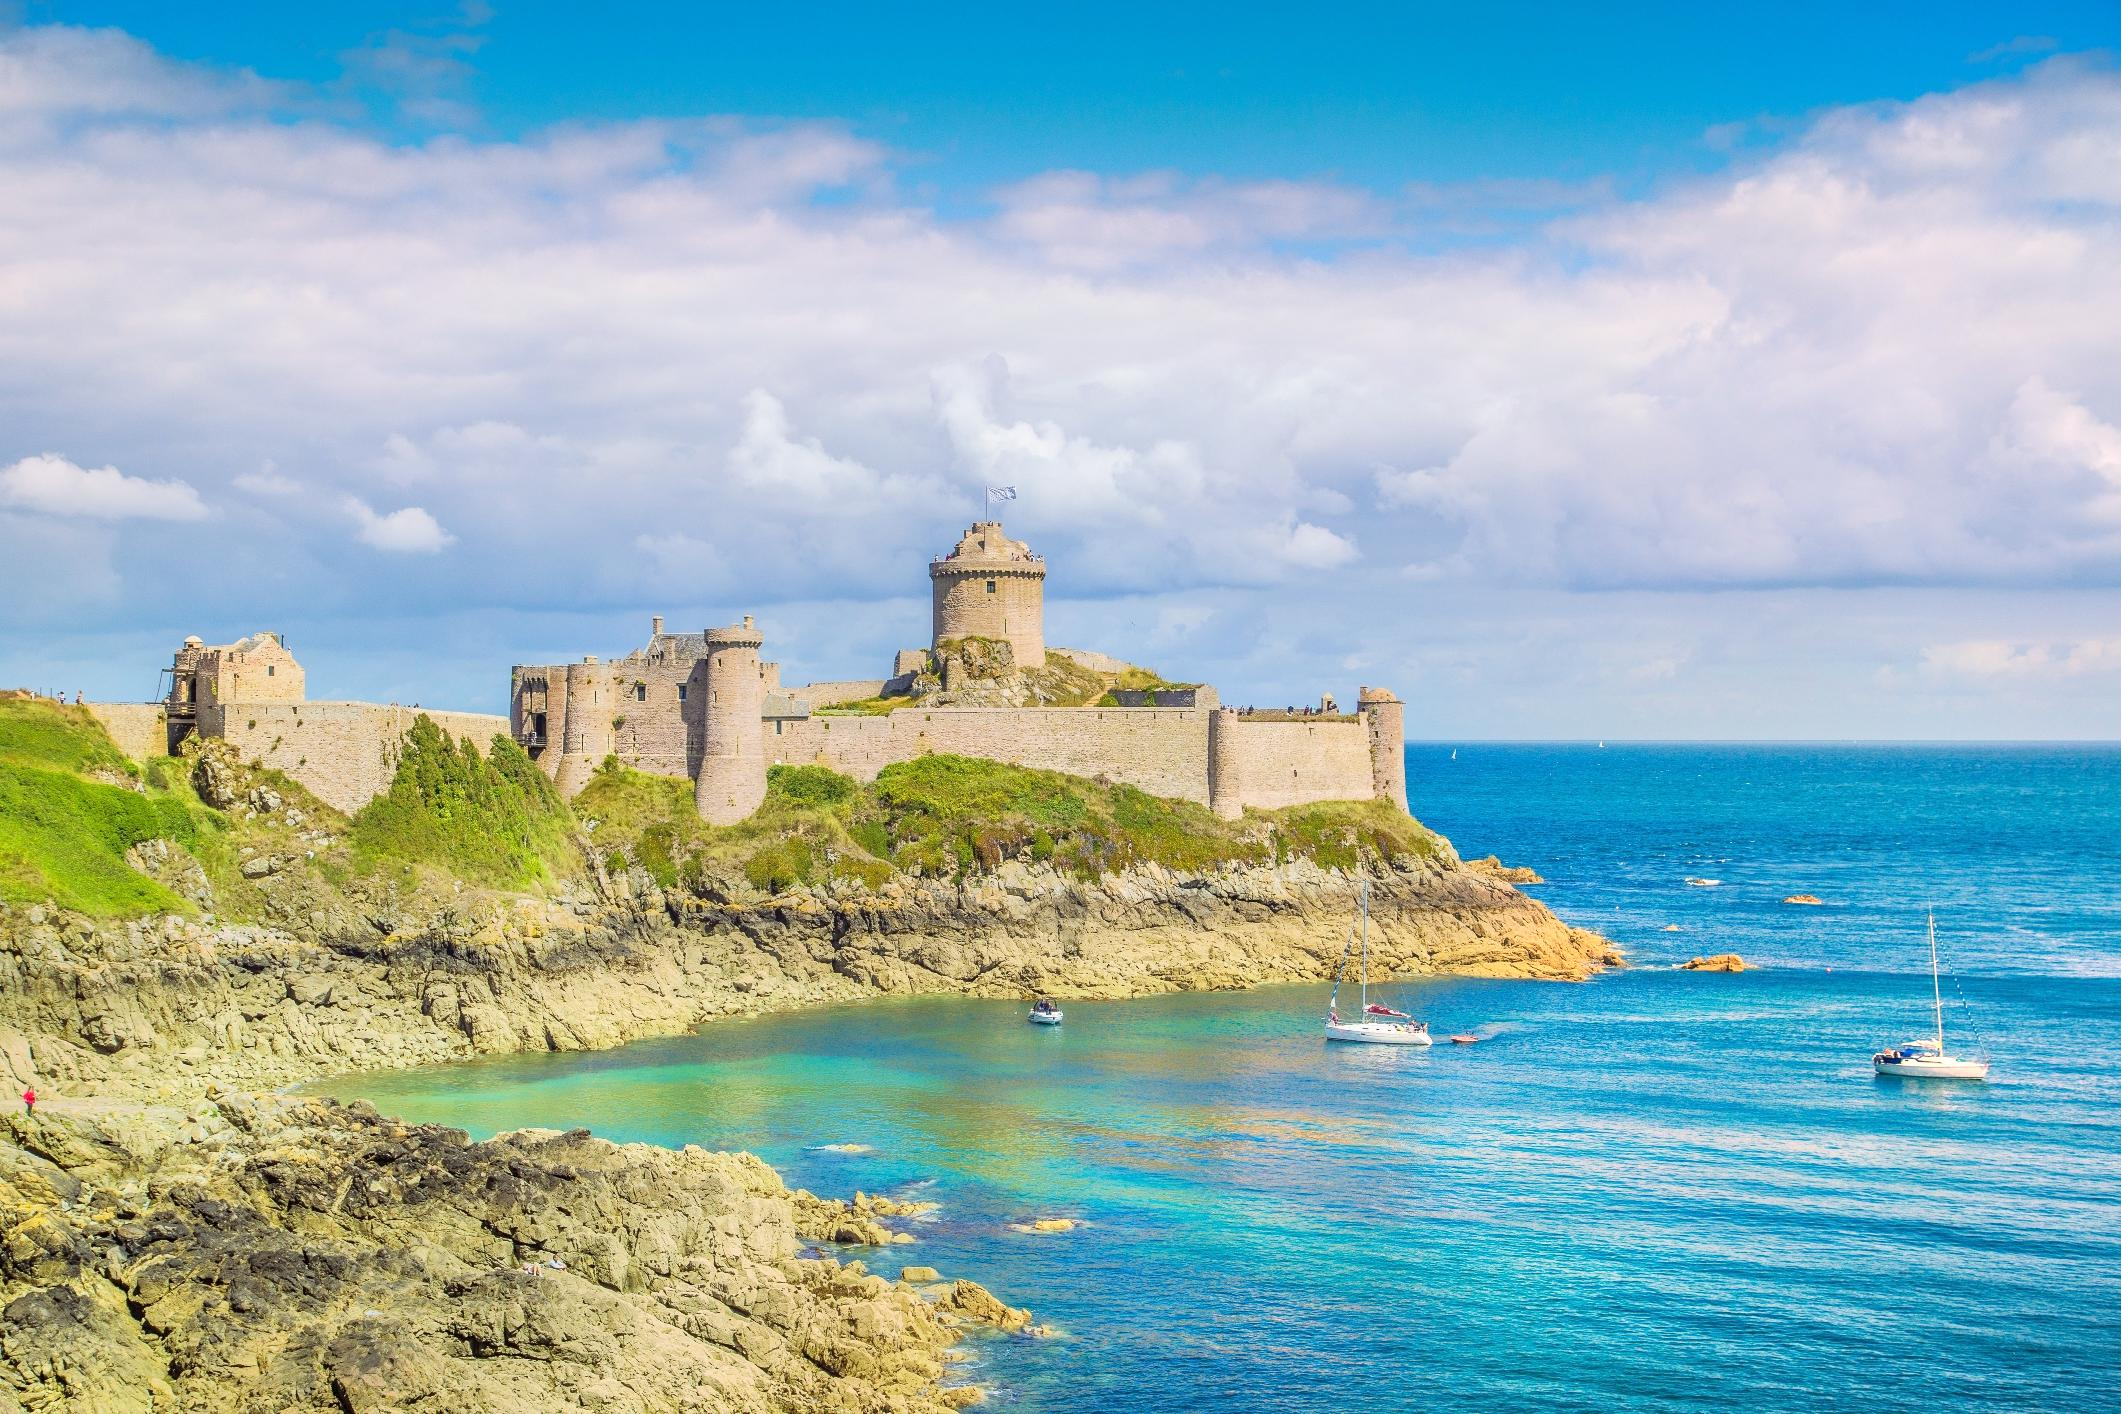 St-Malo Citadel